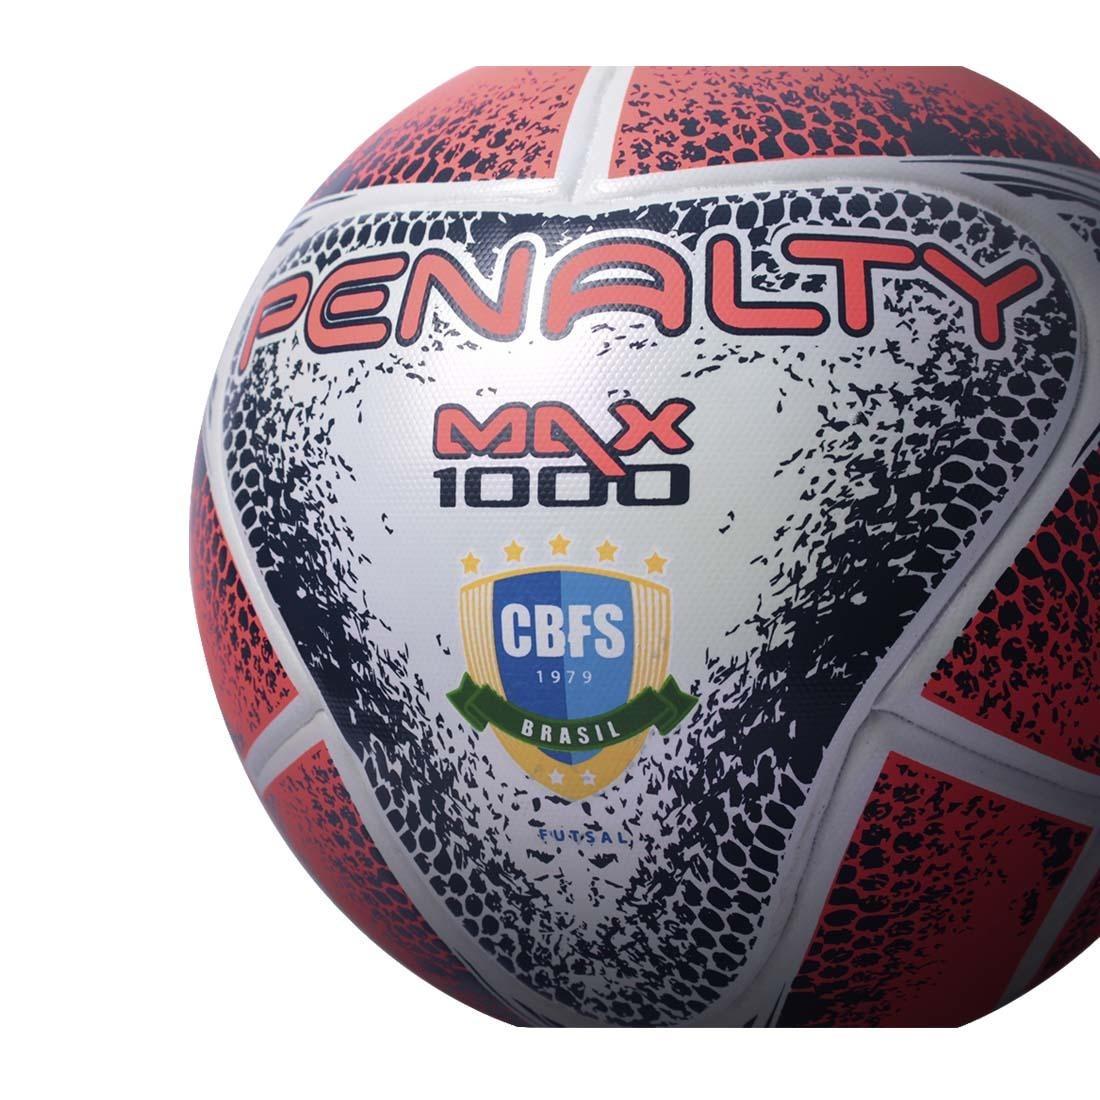 af6d95849 bola futsal penalty max 1000 aprovada fifa 2018 na caixa. Carregando zoom.